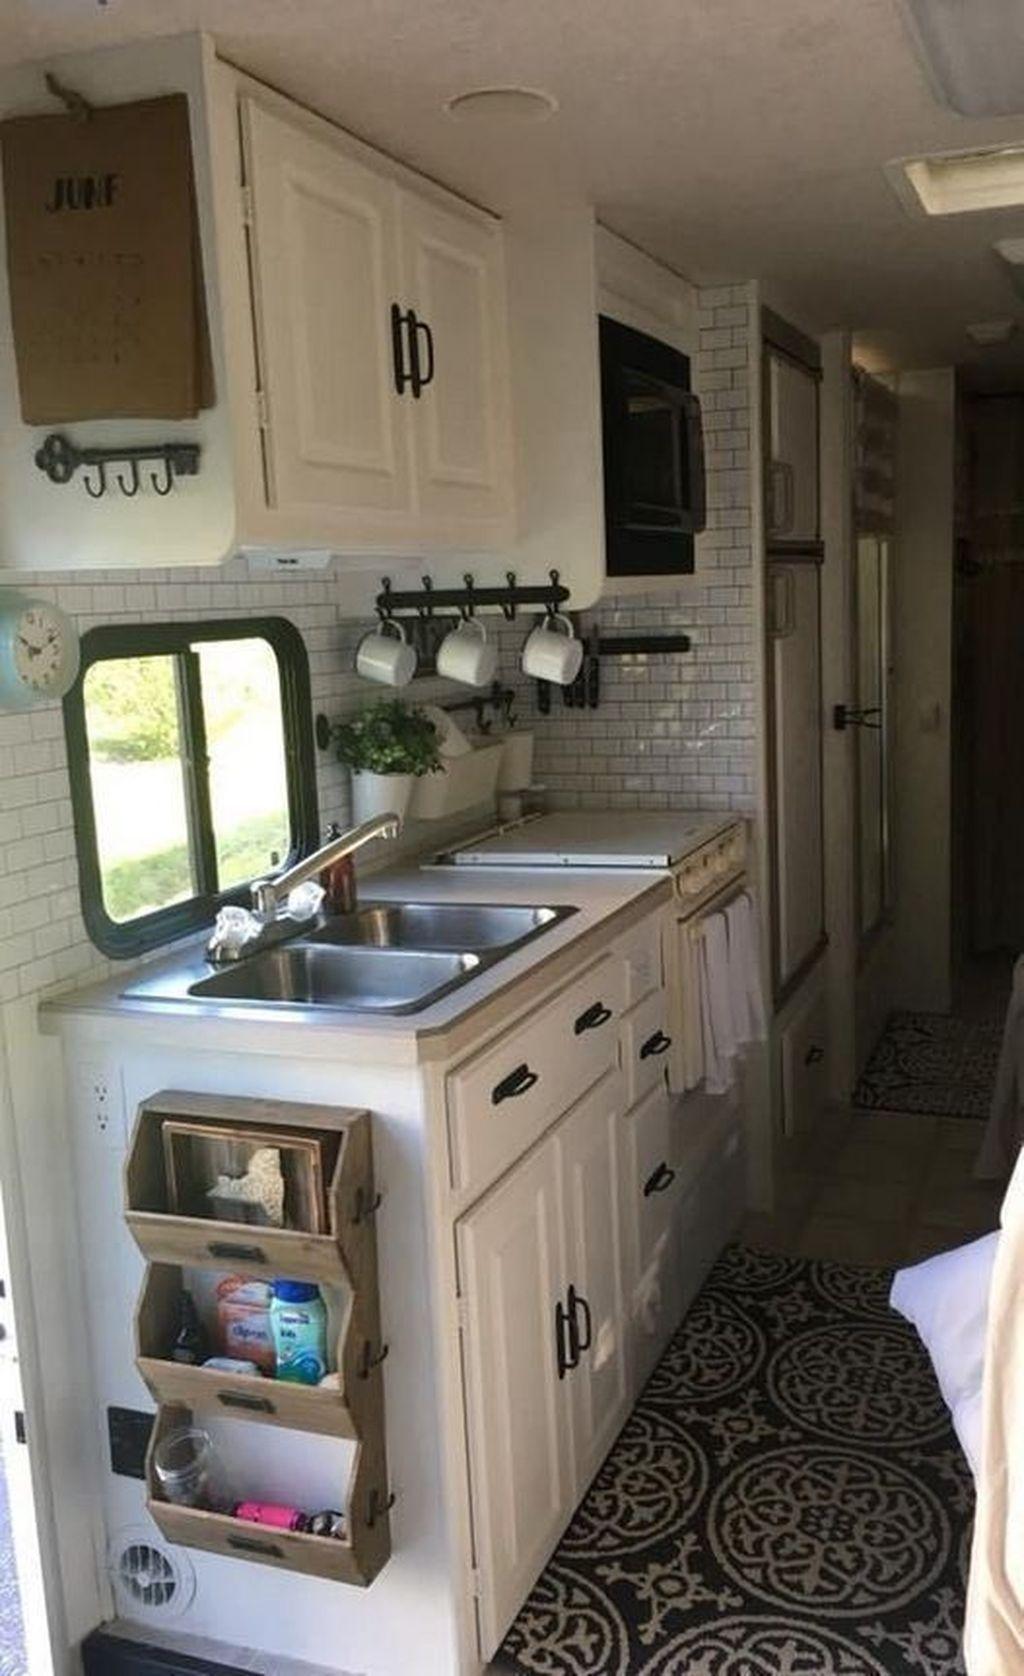 Inspiring Camper Storage Ideas For Rv Travel Trailers In 2020 Remodeled Campers Rv Living Camper Makeover